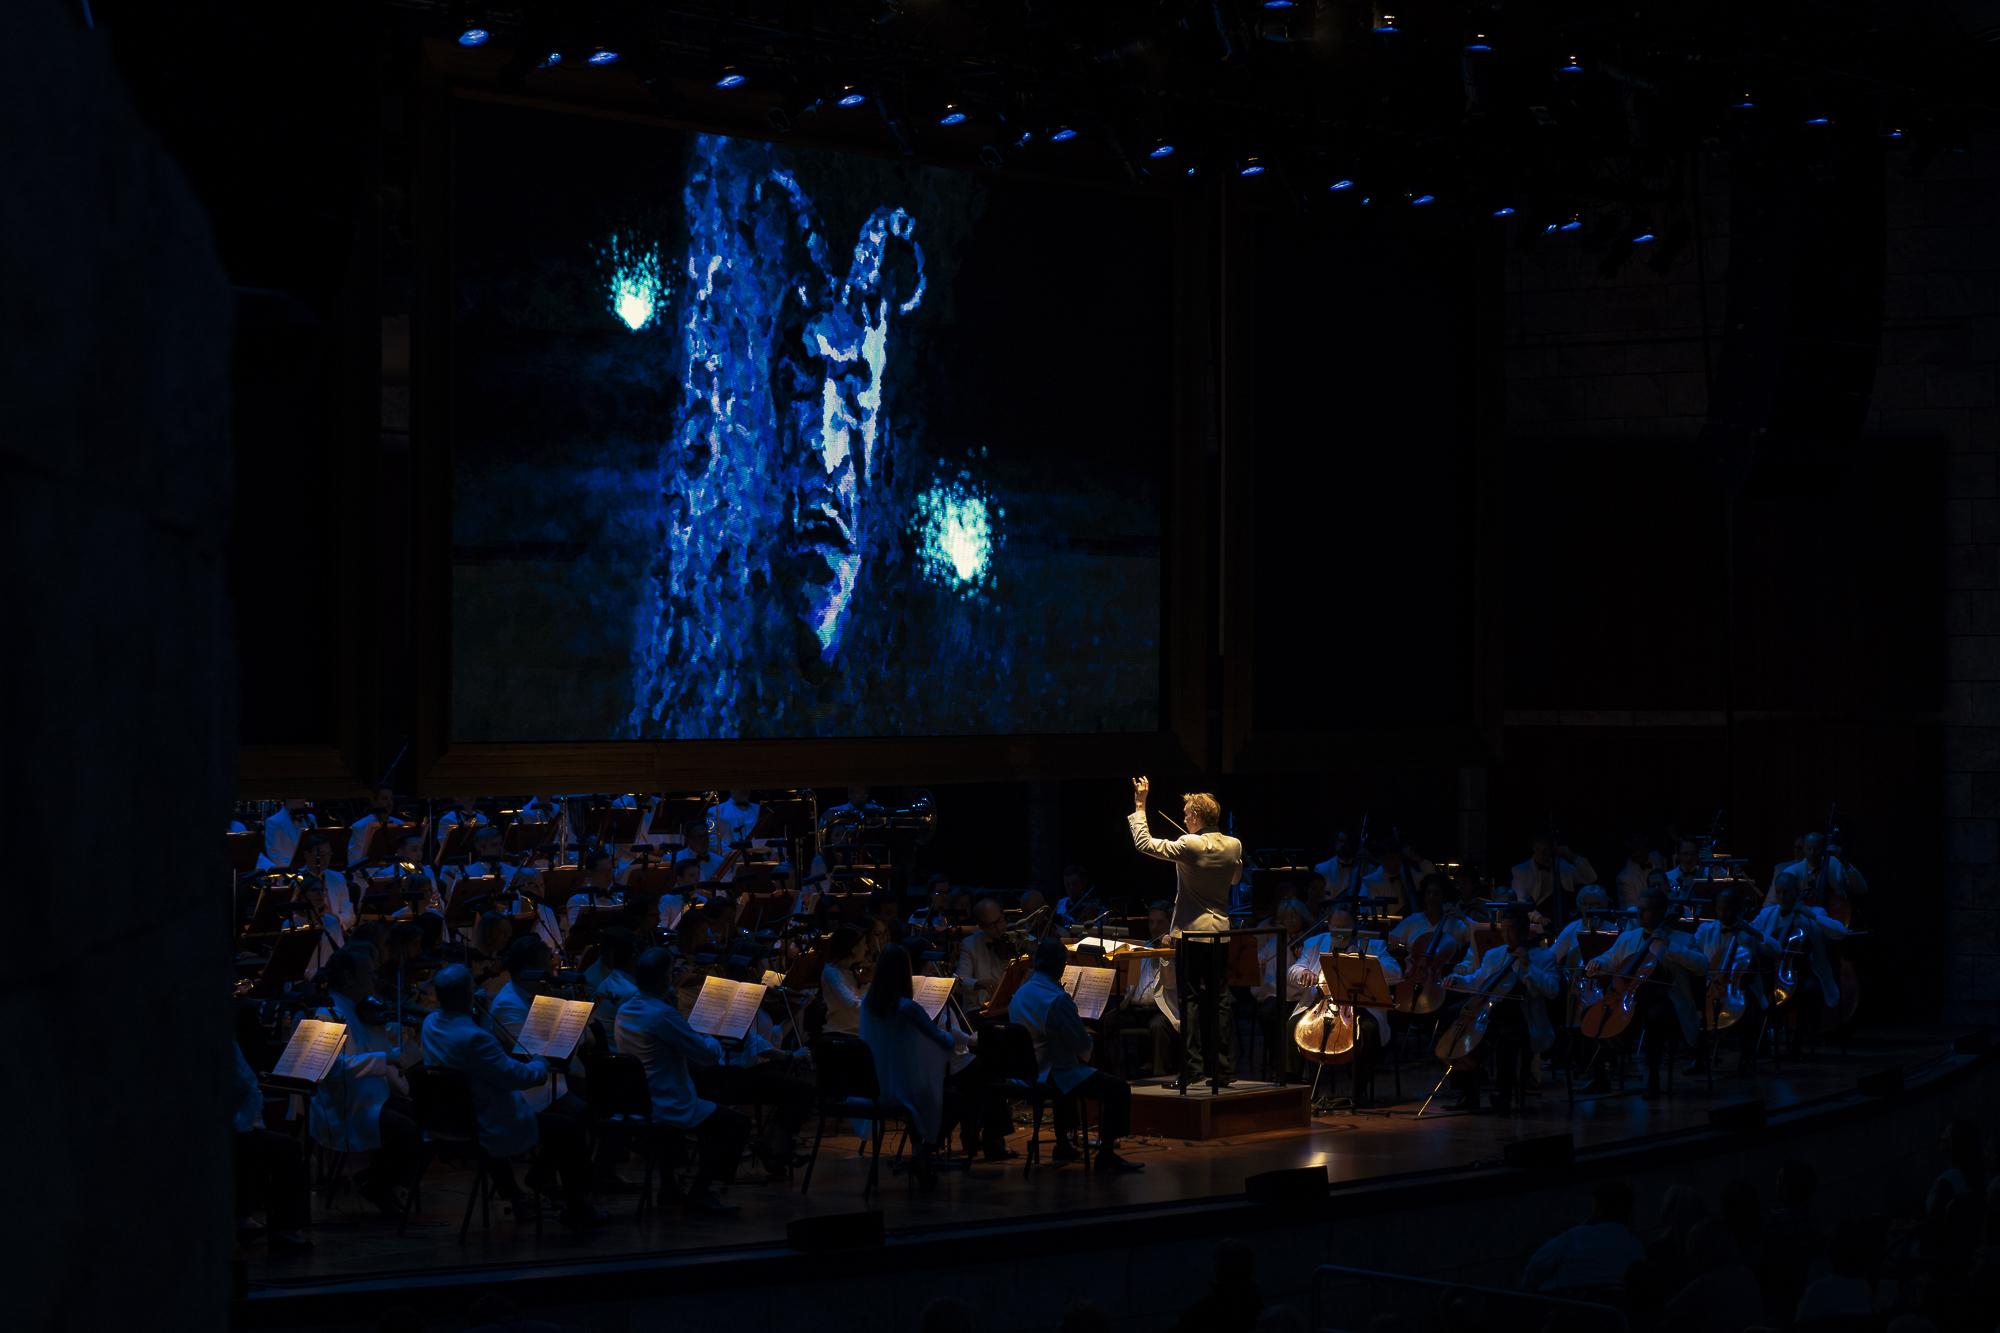 2018 SVSS Daphnis et Chloe Orchestra 8-23-18 - 40501 - Nils Ribi - web -2.jpg